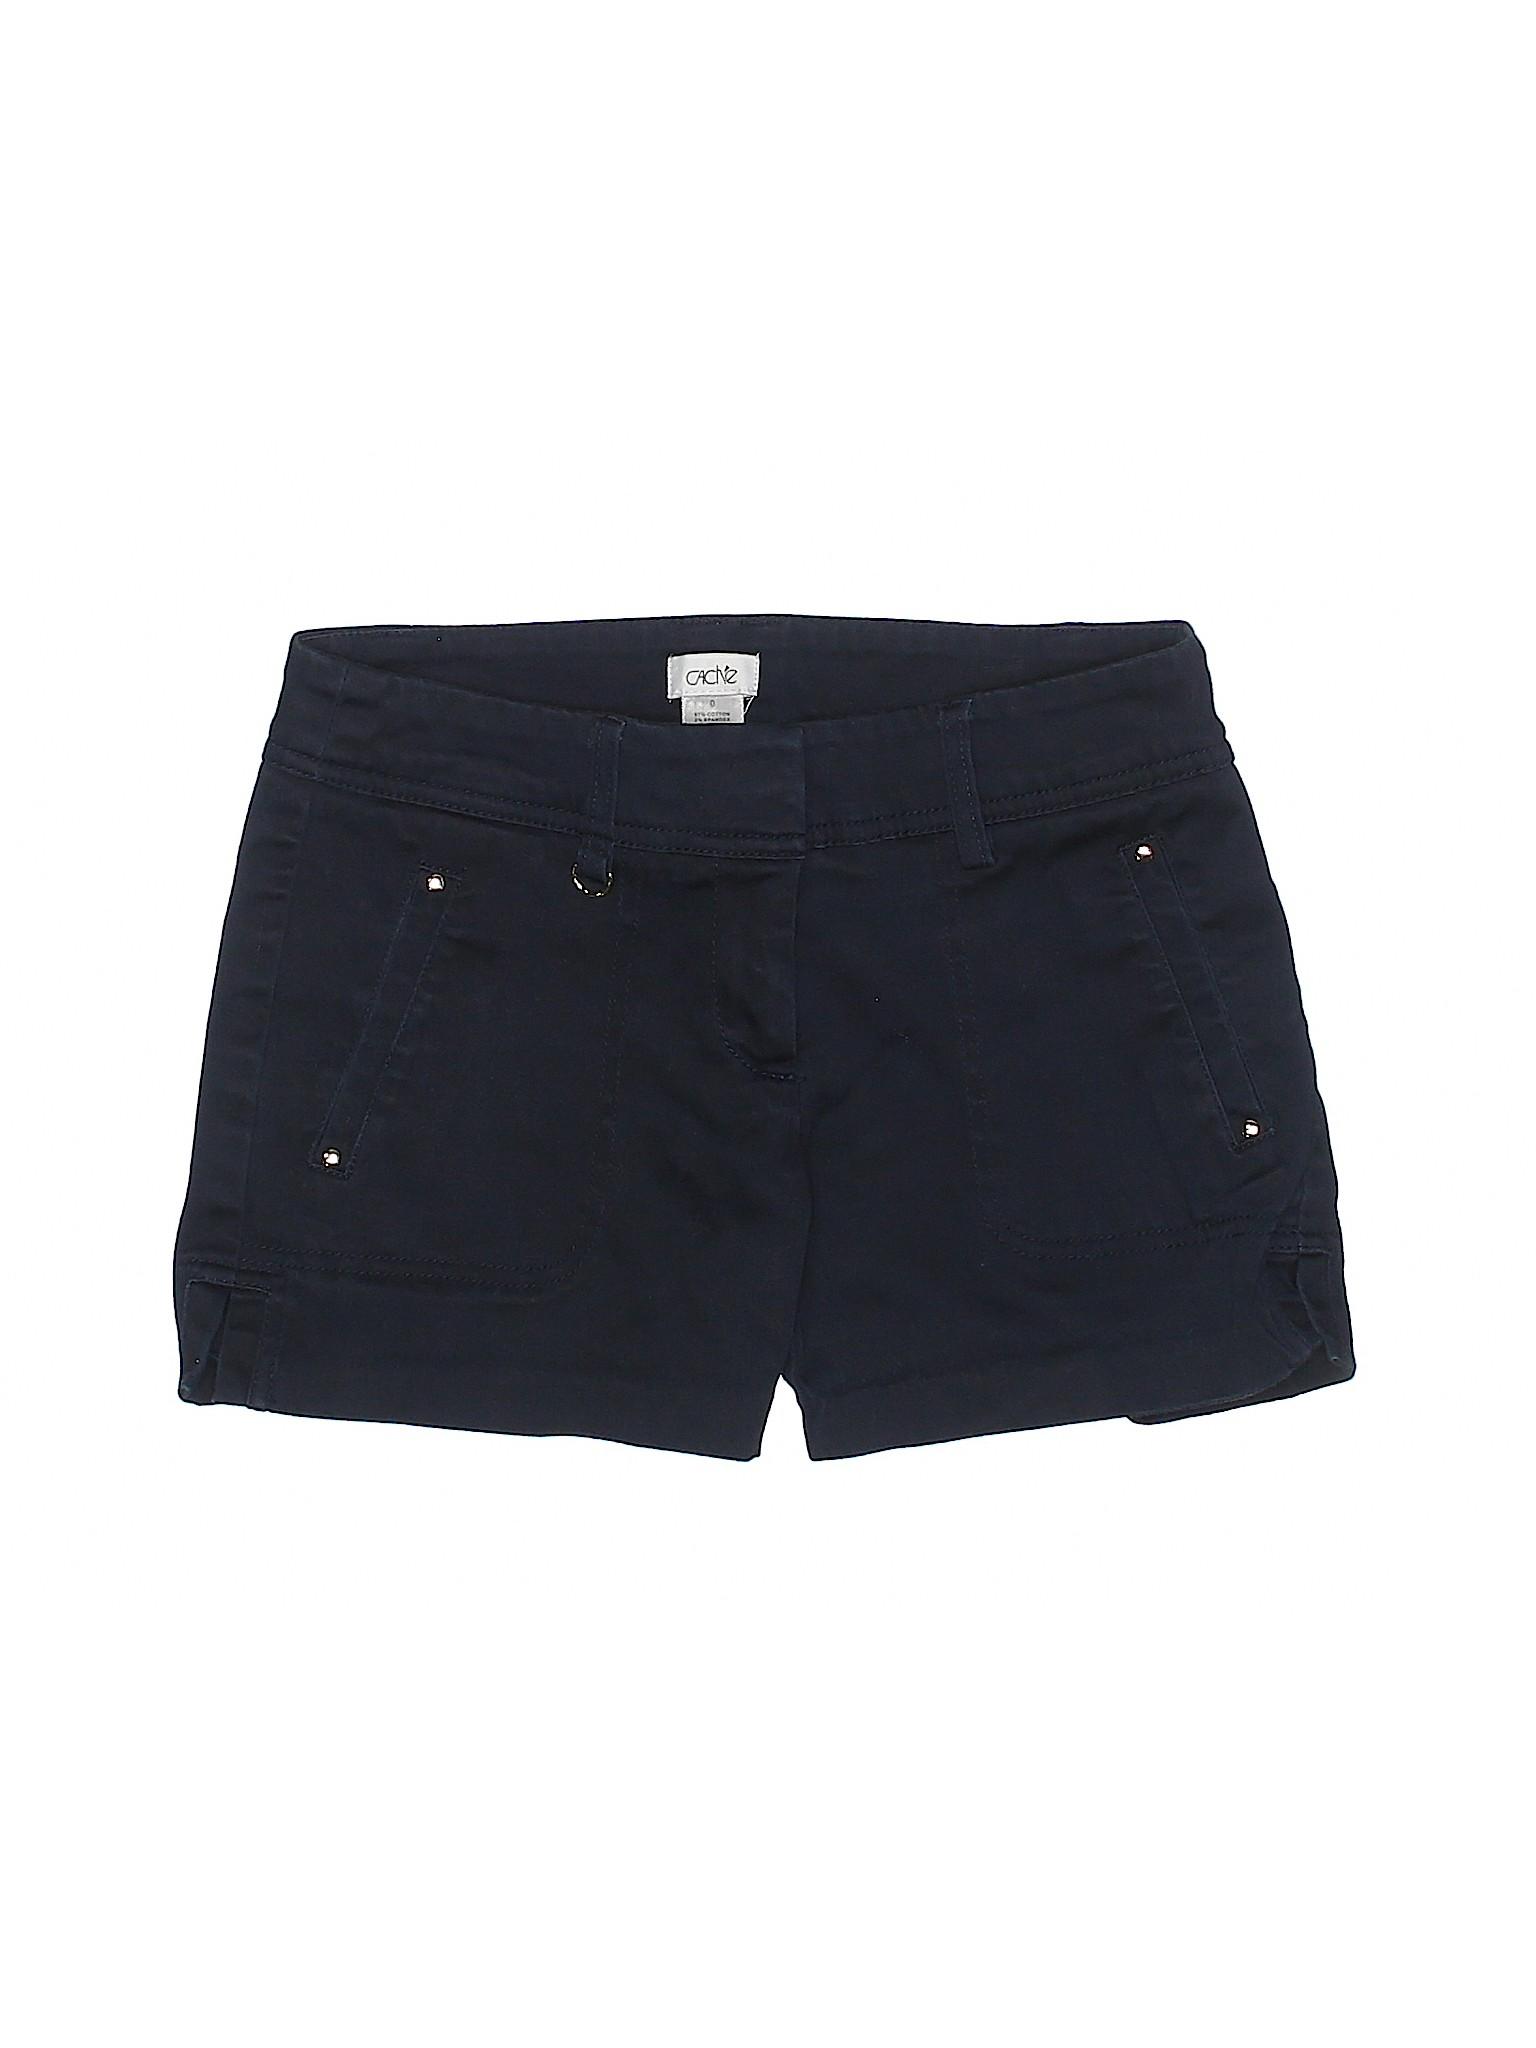 Khaki leisure leisure Shorts Shorts leisure Cache Boutique Boutique Khaki Shorts Cache leisure Boutique Cache Boutique Khaki xRqwU6AC